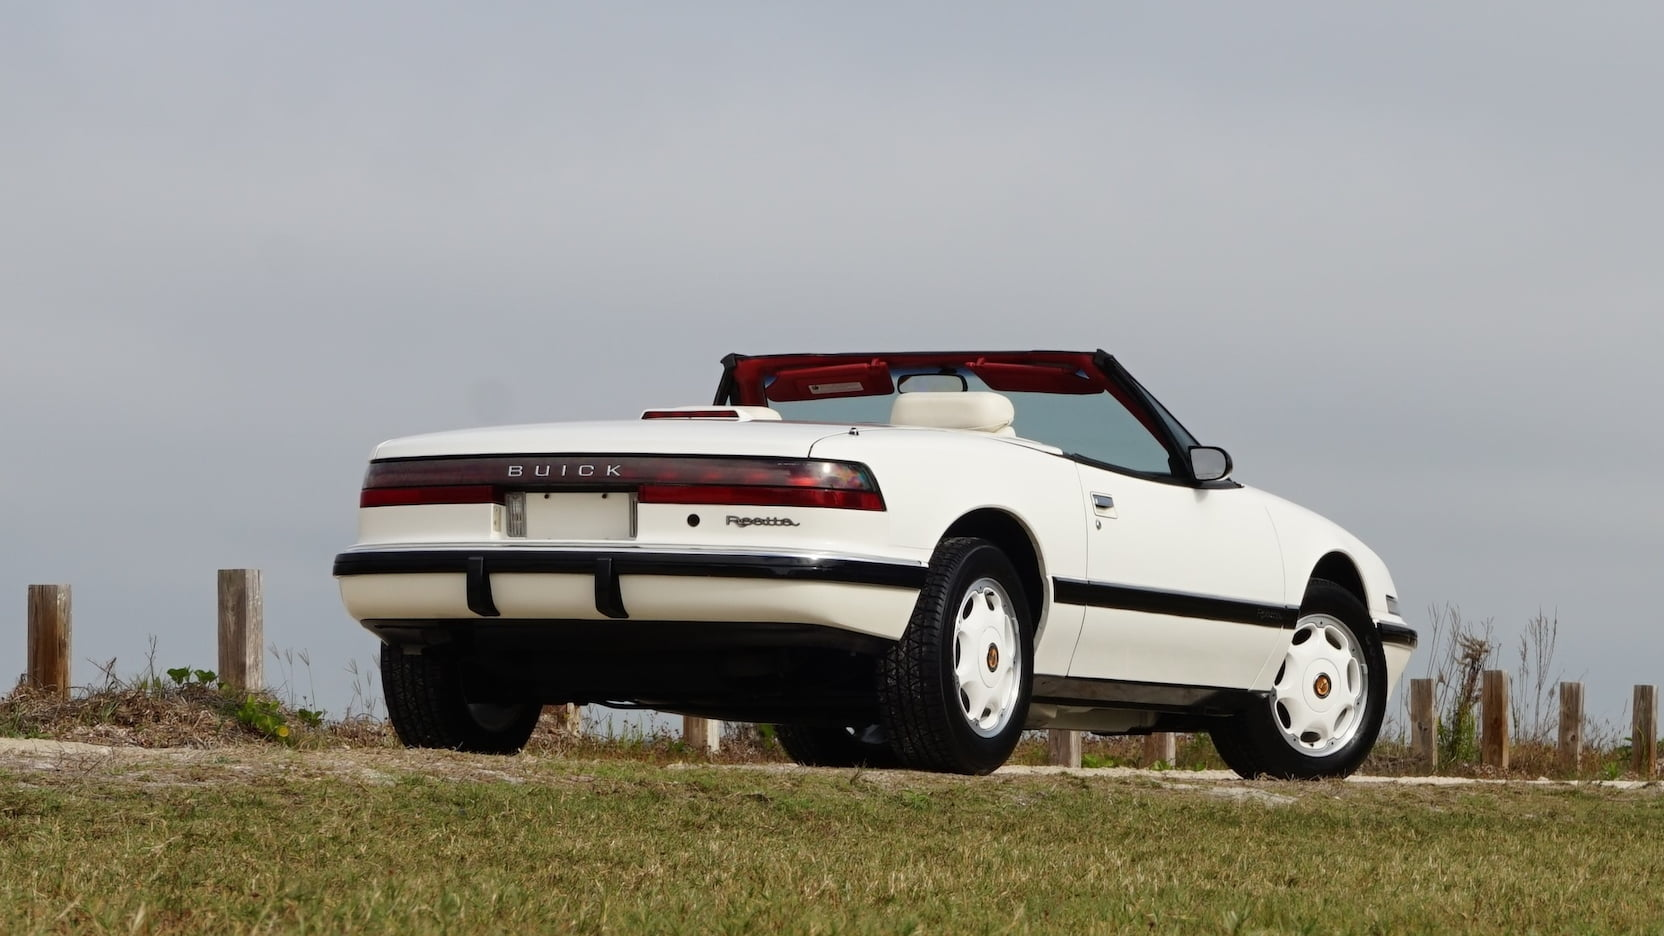 1990 Buick Reatta rear 3/4